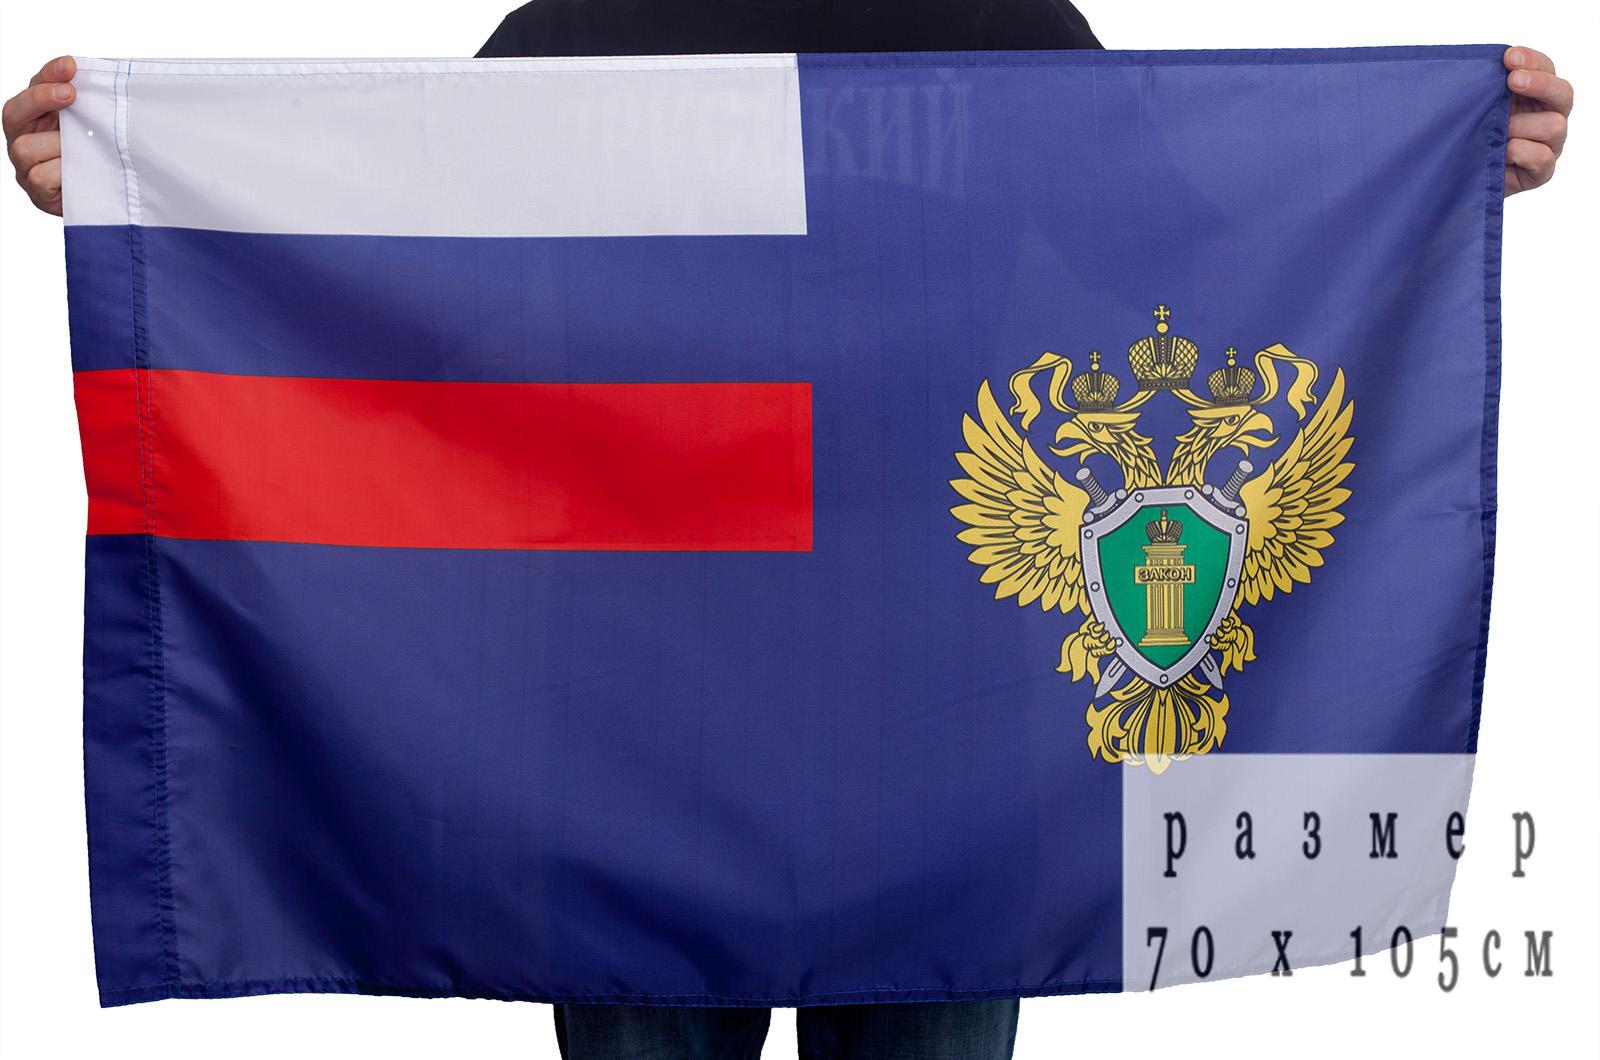 Флаг Прокуратуры